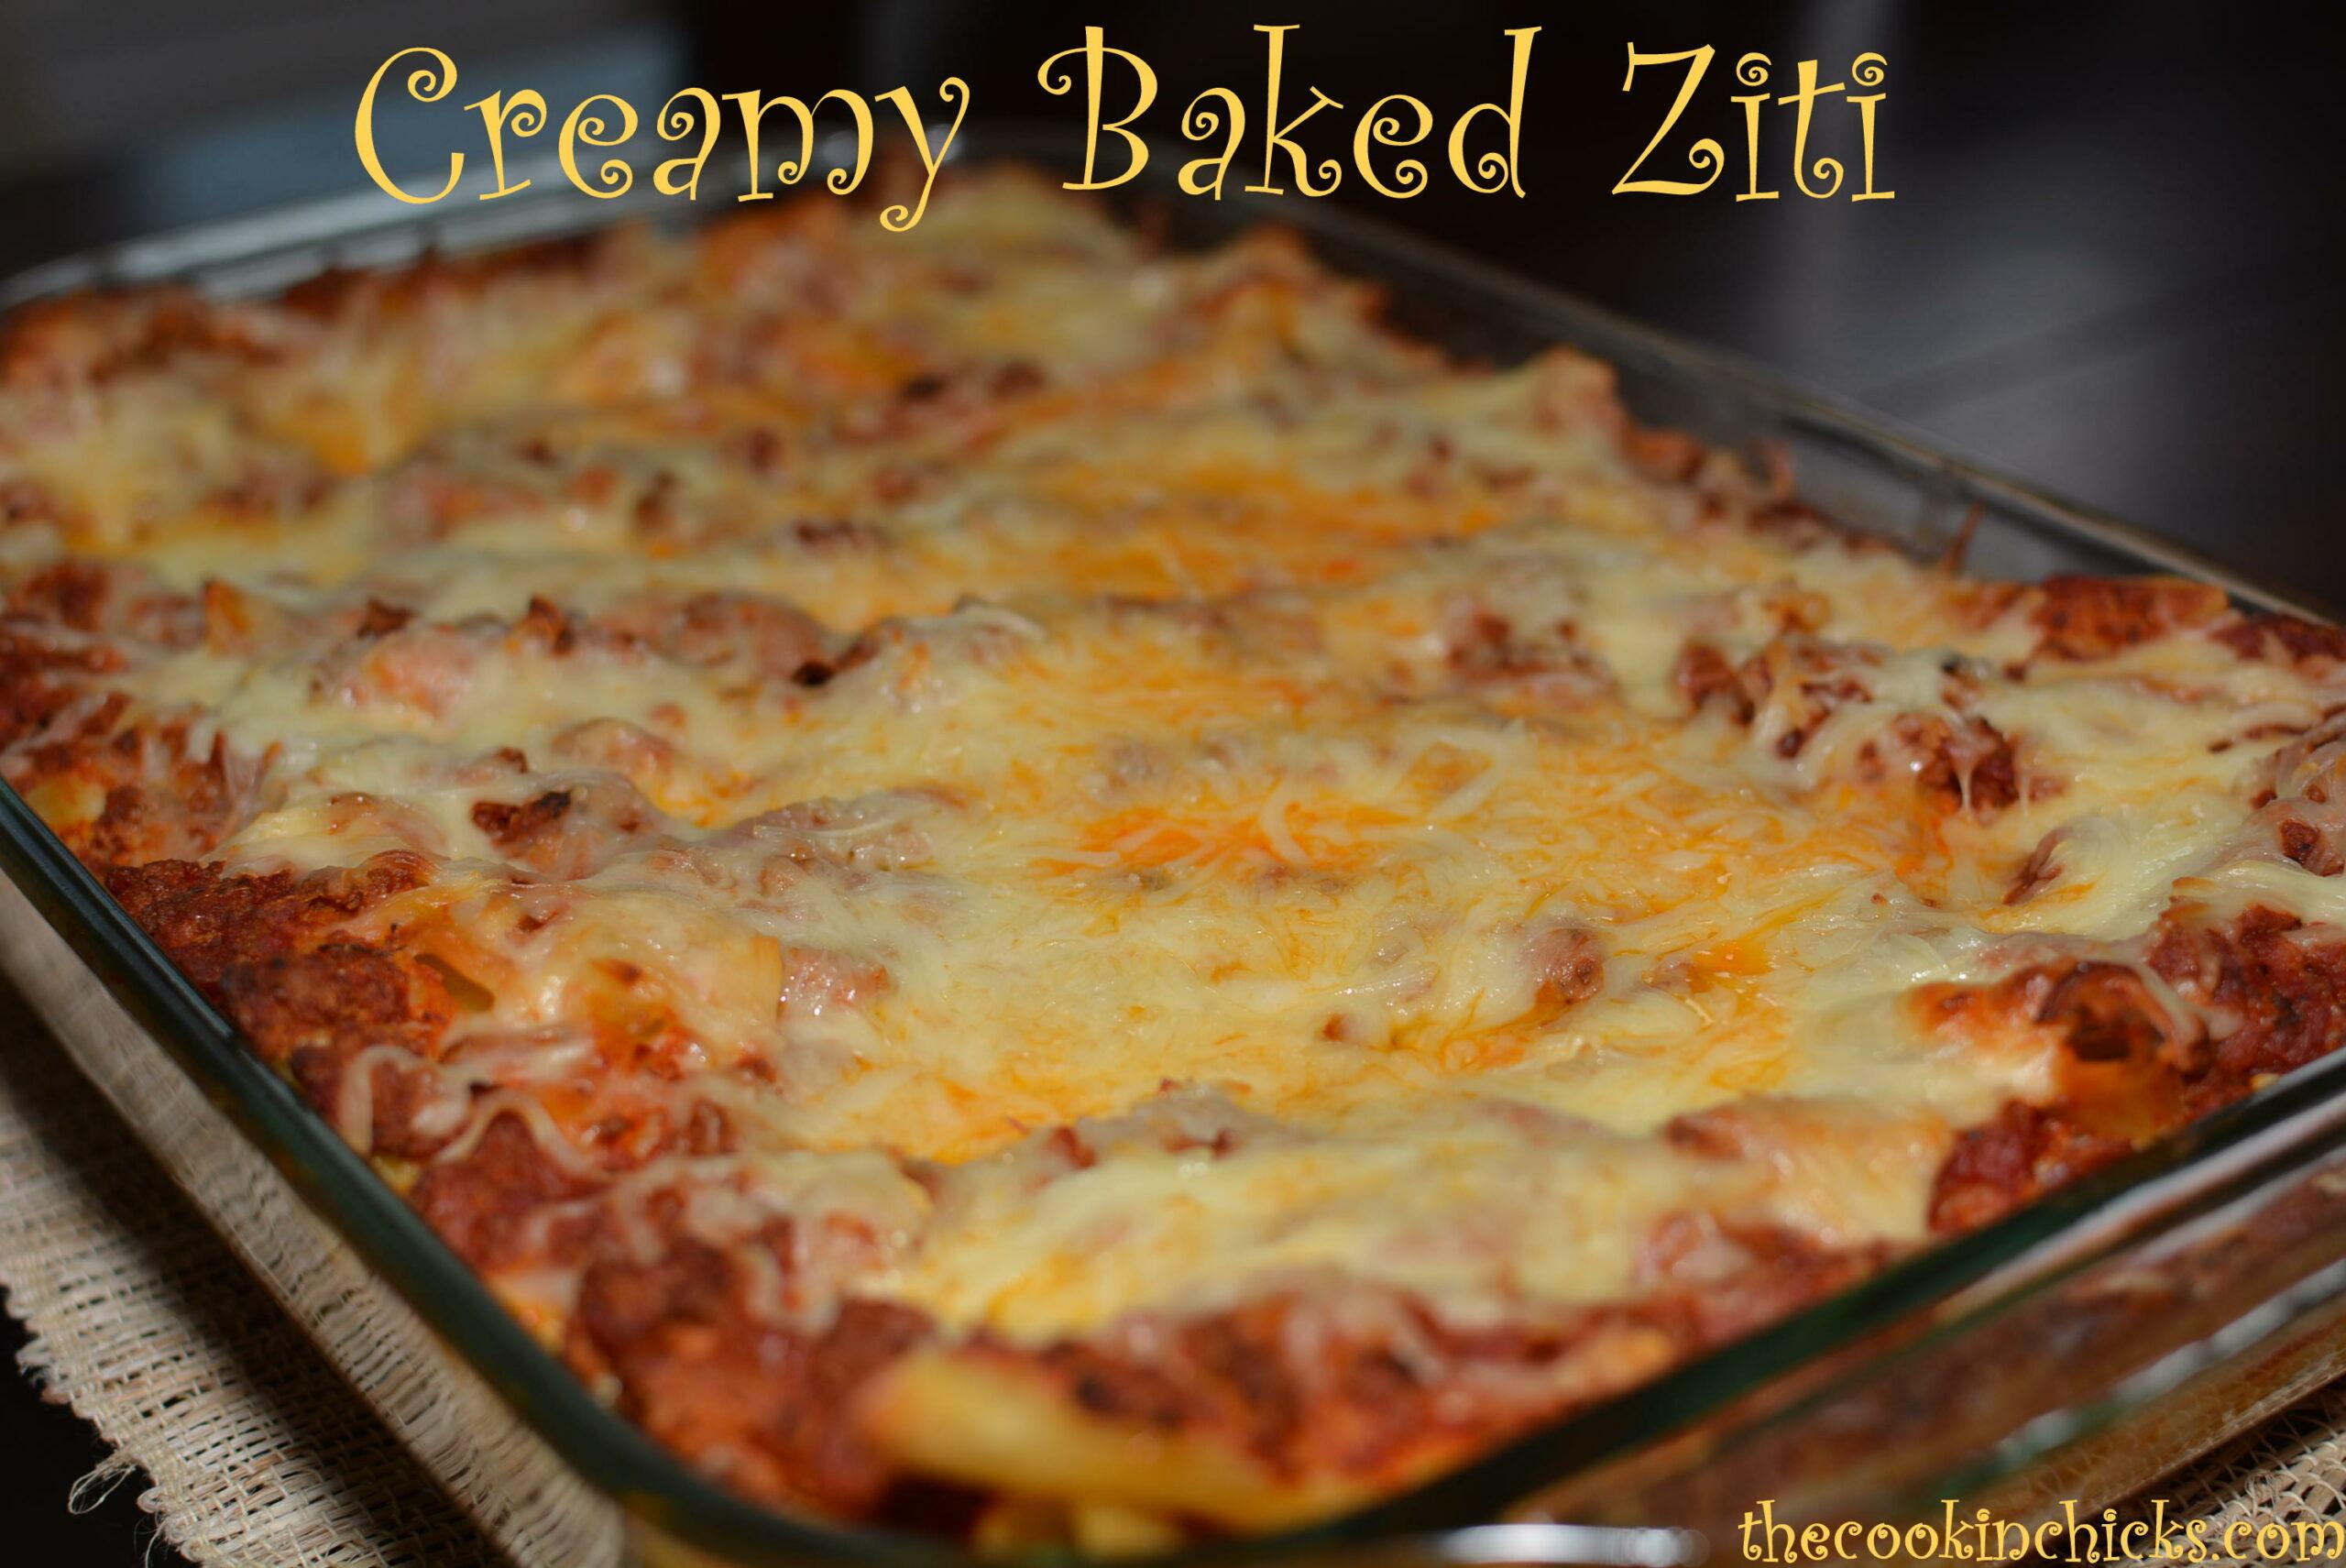 Creamy Baked Ziti The Cookin Chicks